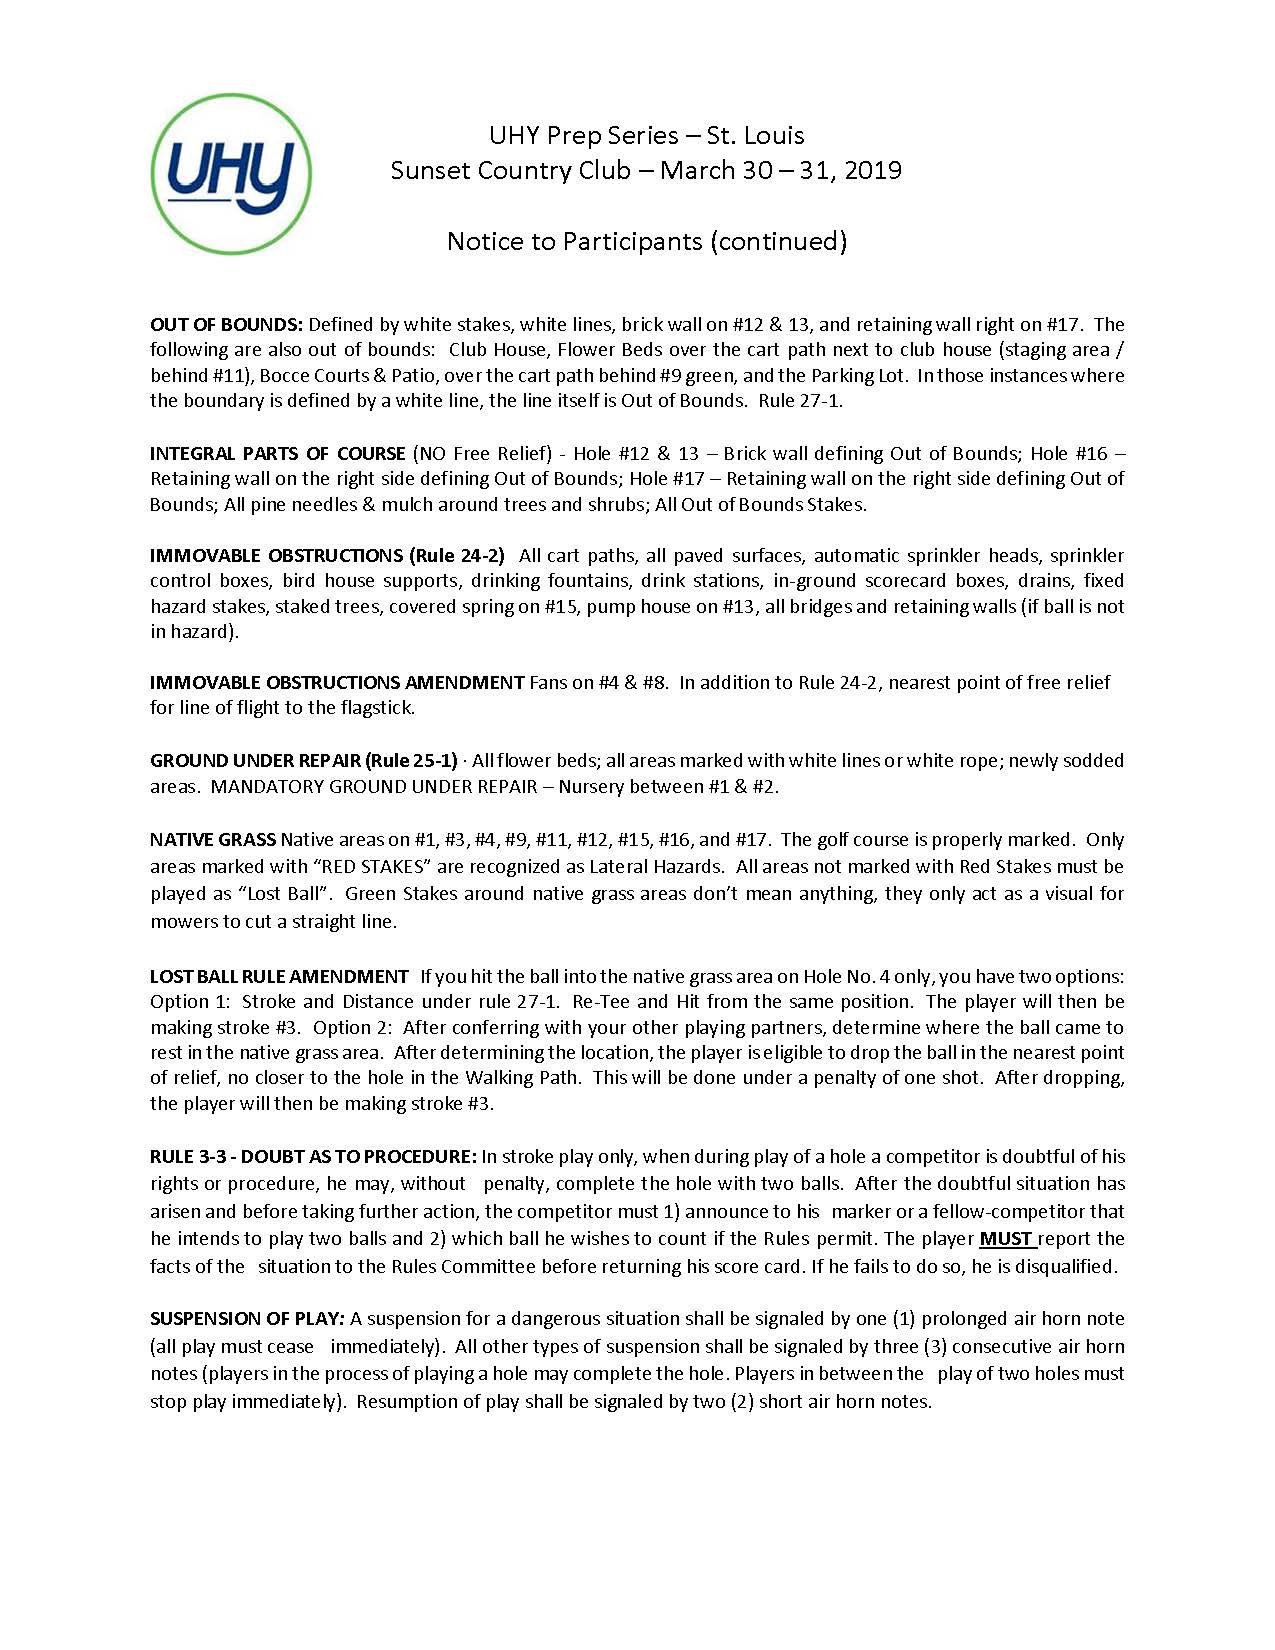 Rules Sheet - UHY LLP CPA's Prep Series - STL (MAR 30 - 31 2019)_Page_2.jpg